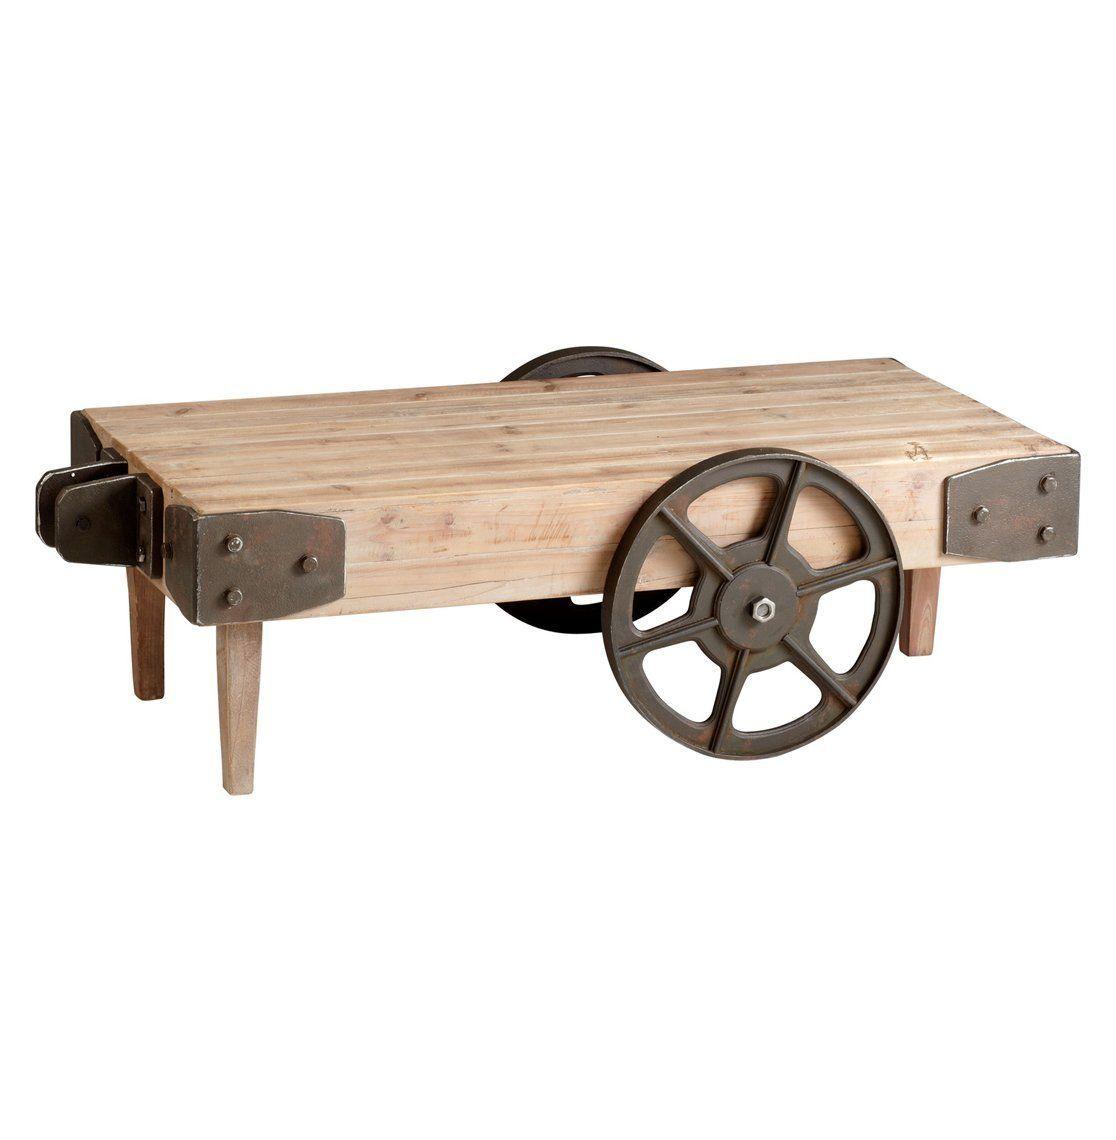 - 61MiGGfiyIL._SL1500_.jpg Rustic Coffee Tables, Coffee Table With